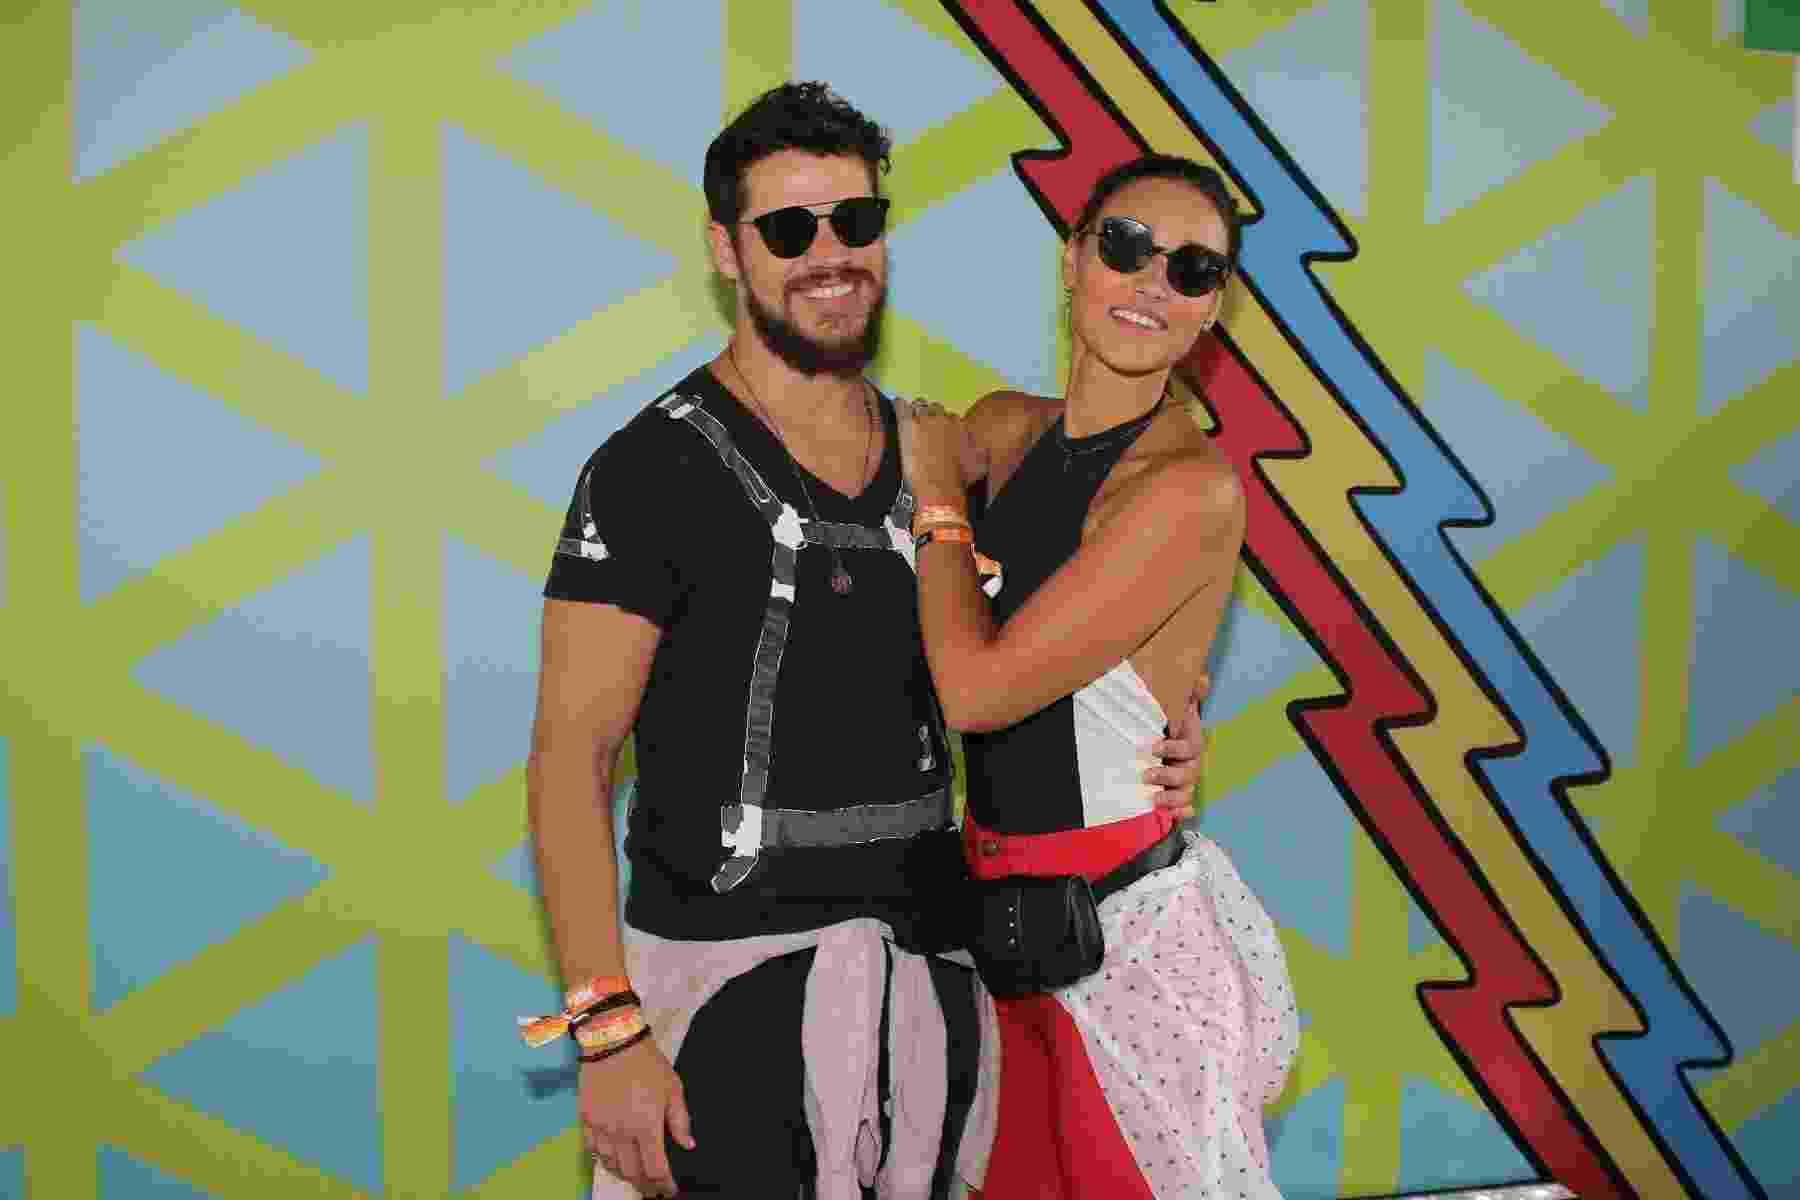 José Loreto e Débora Nascimento no segundo dia do Lolla - Thiago Duran/AgNews